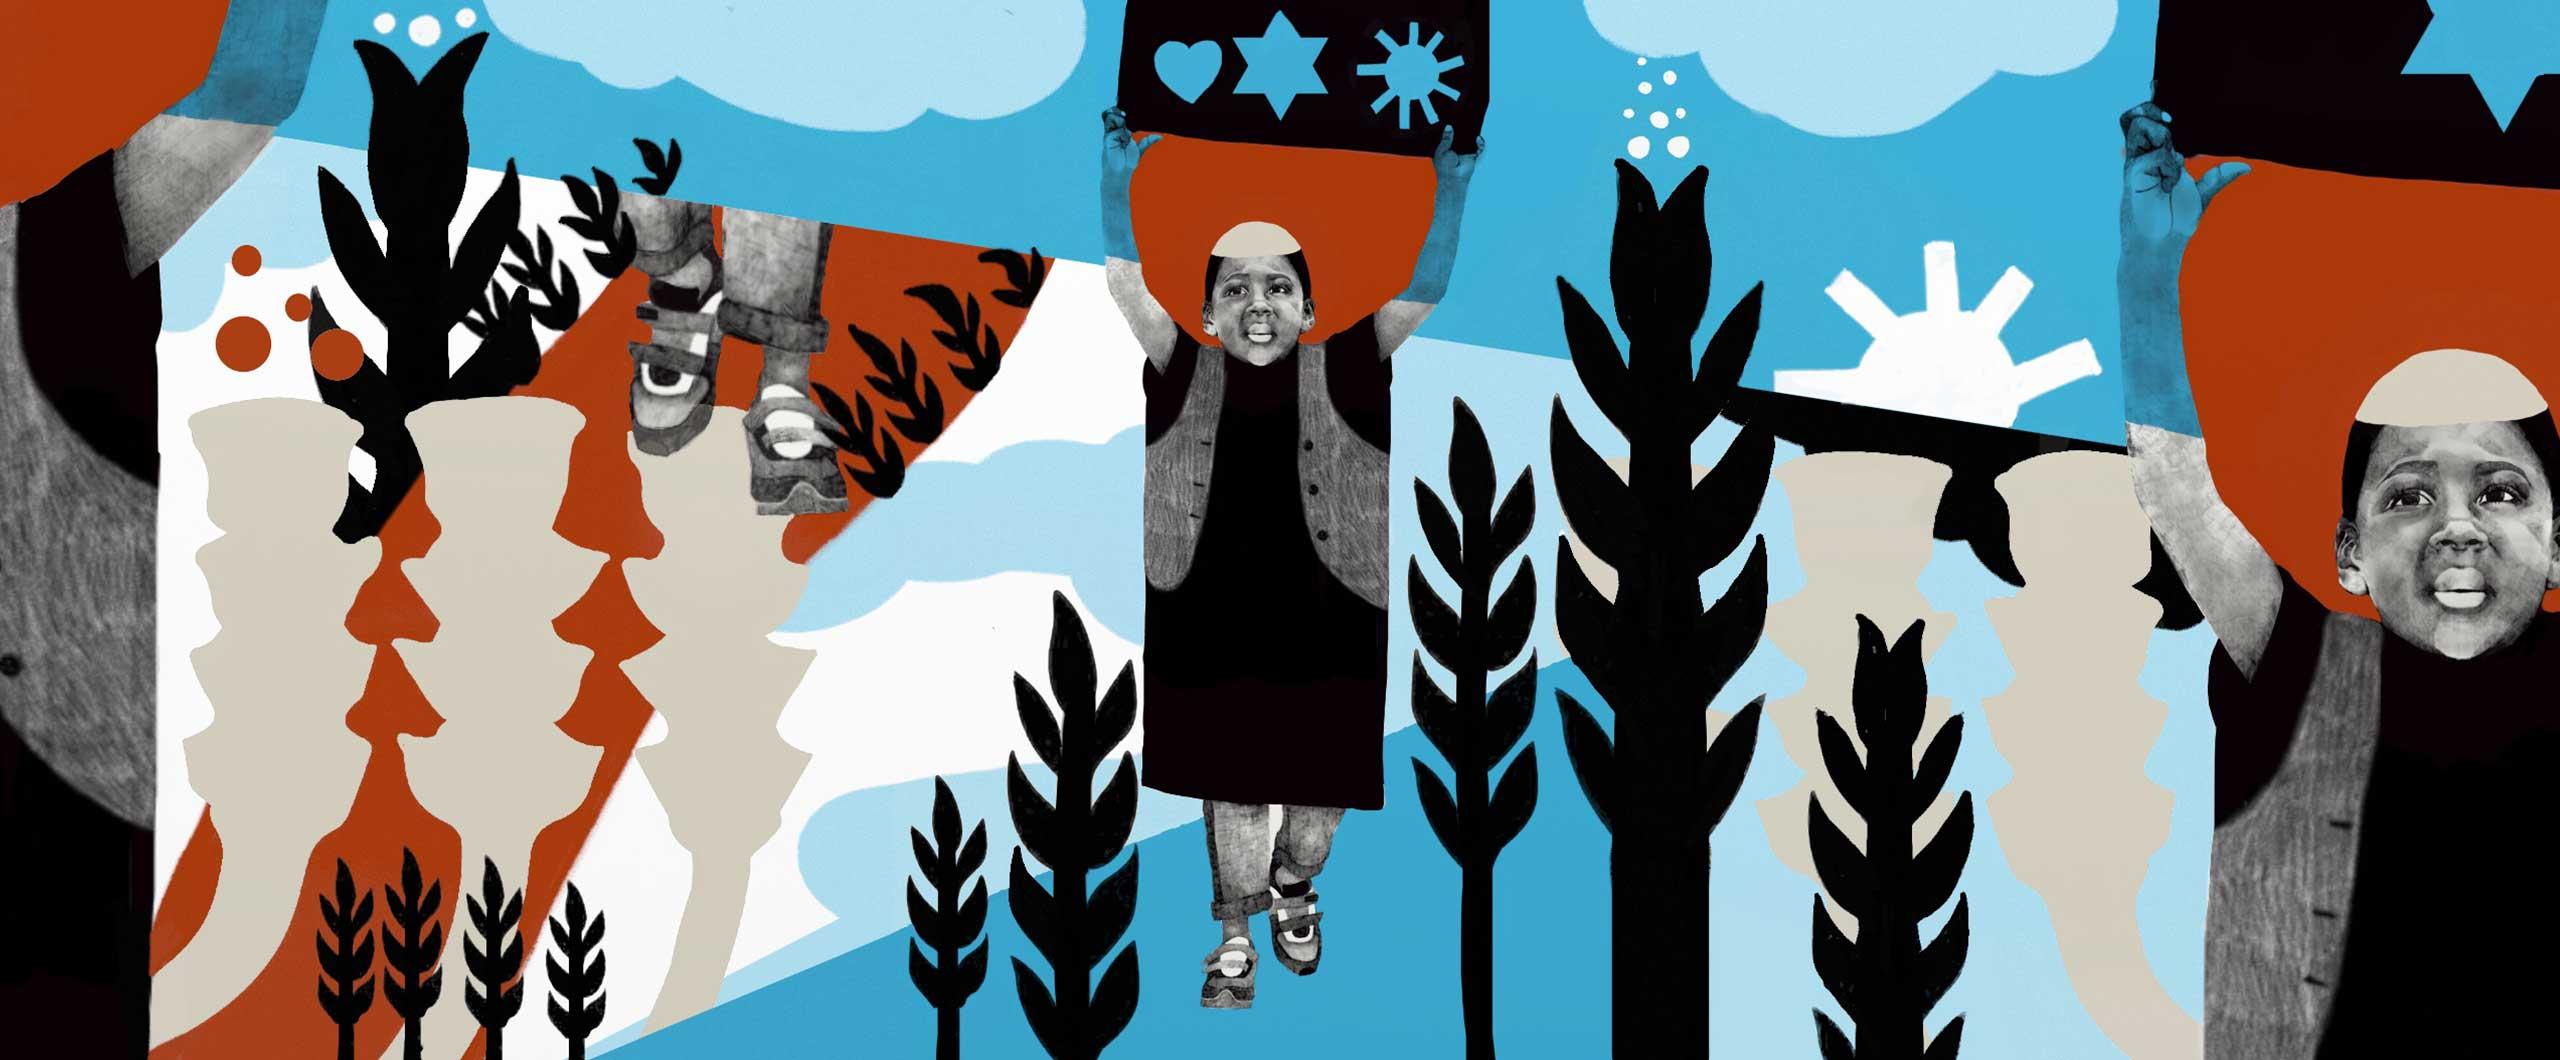 Black hebrew israelites clipart clip art black and white download African Hebrew Israelites: How African-American Utopian Separatists ... clip art black and white download